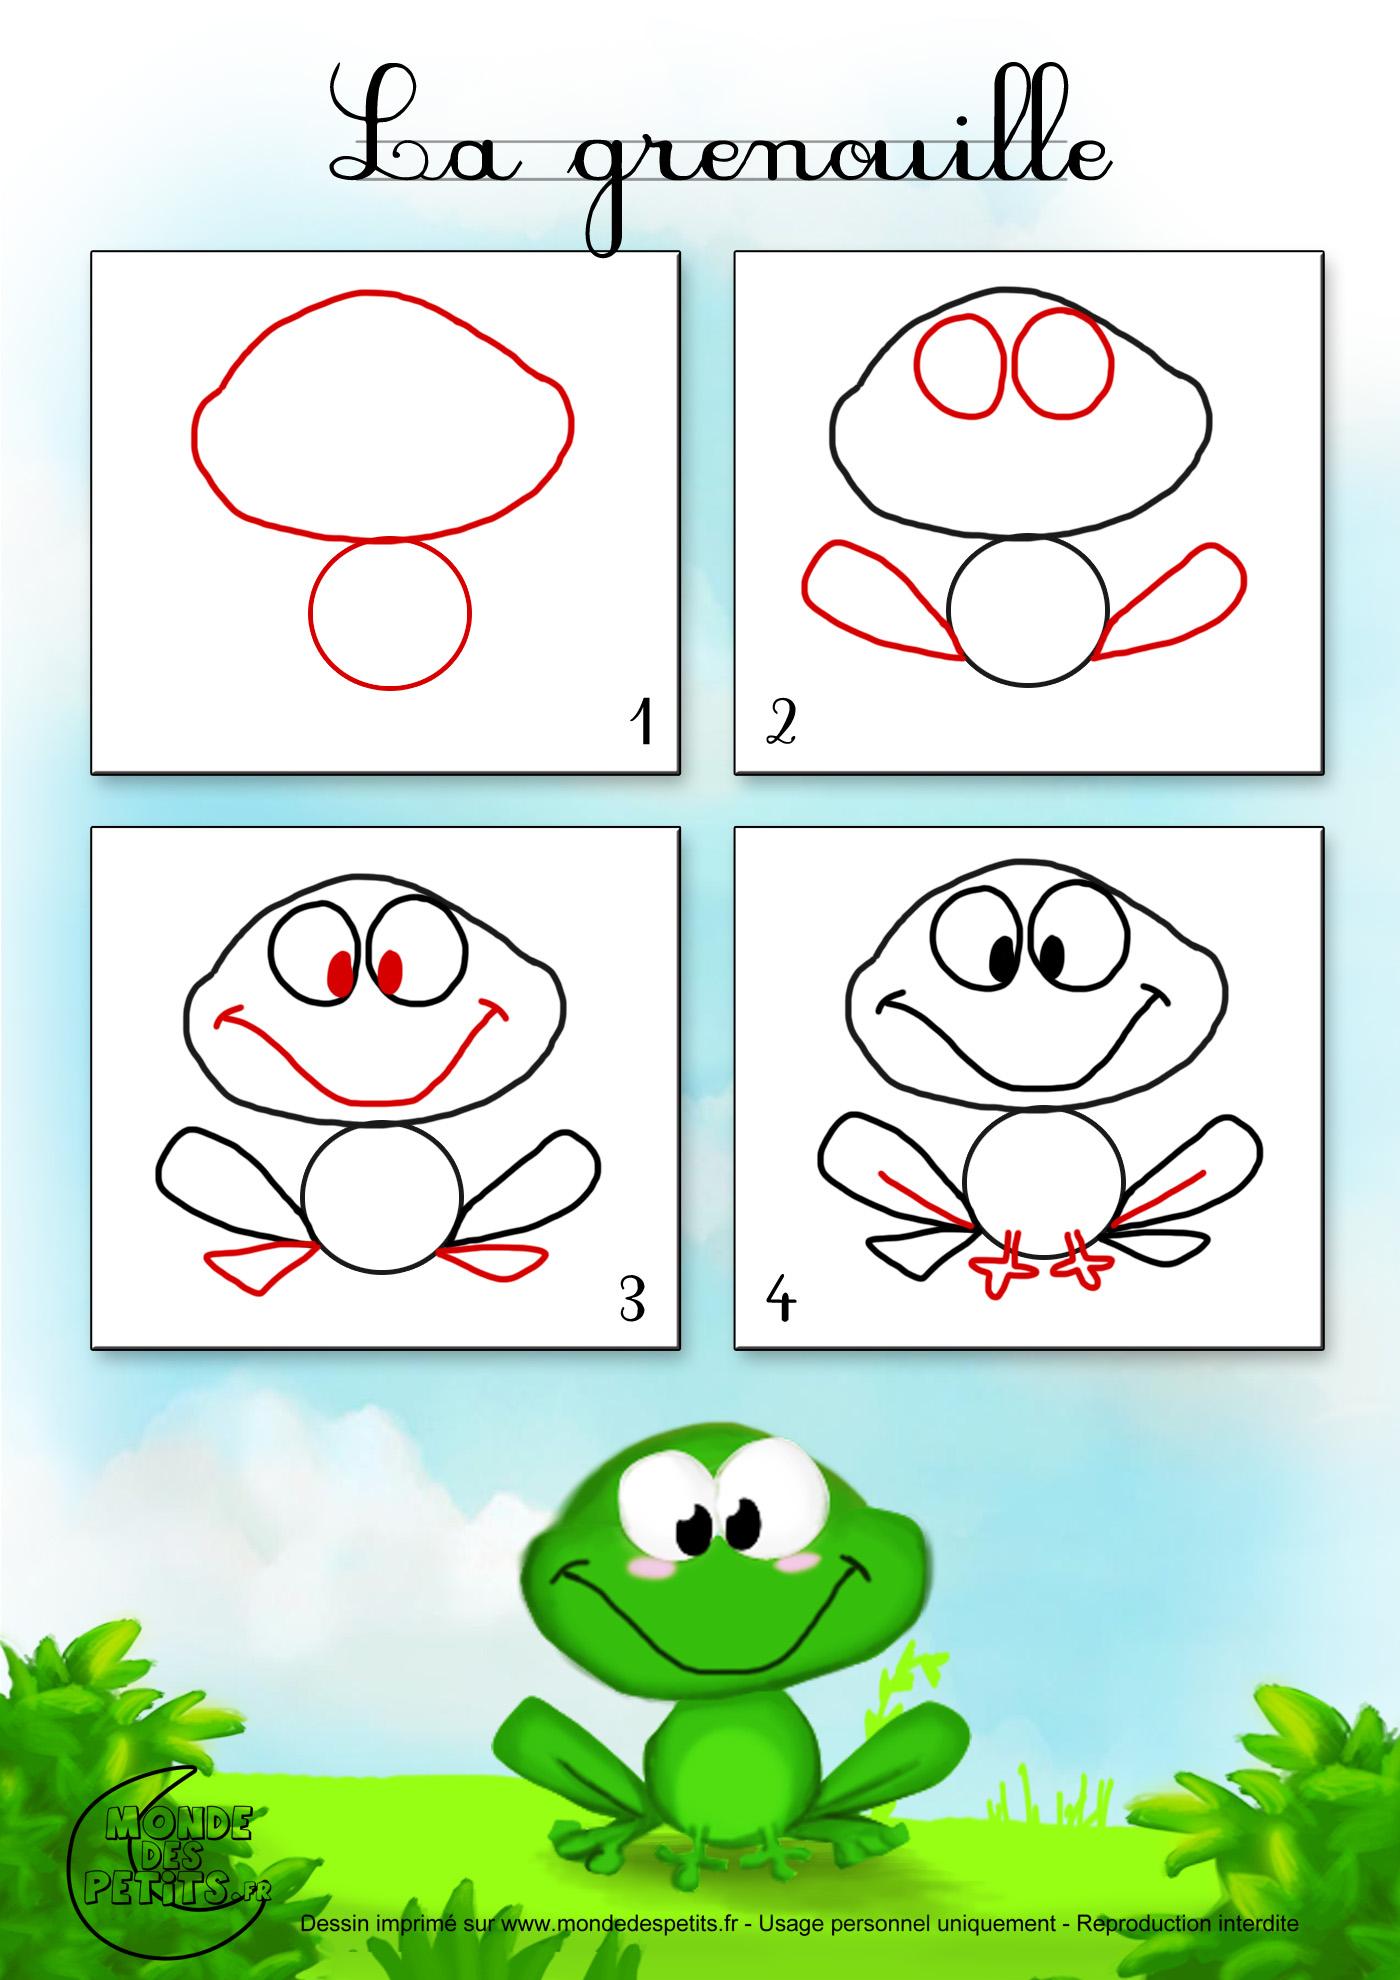 Tutoriel dessin maternelle - Apprendre a dessiner pour enfant ...